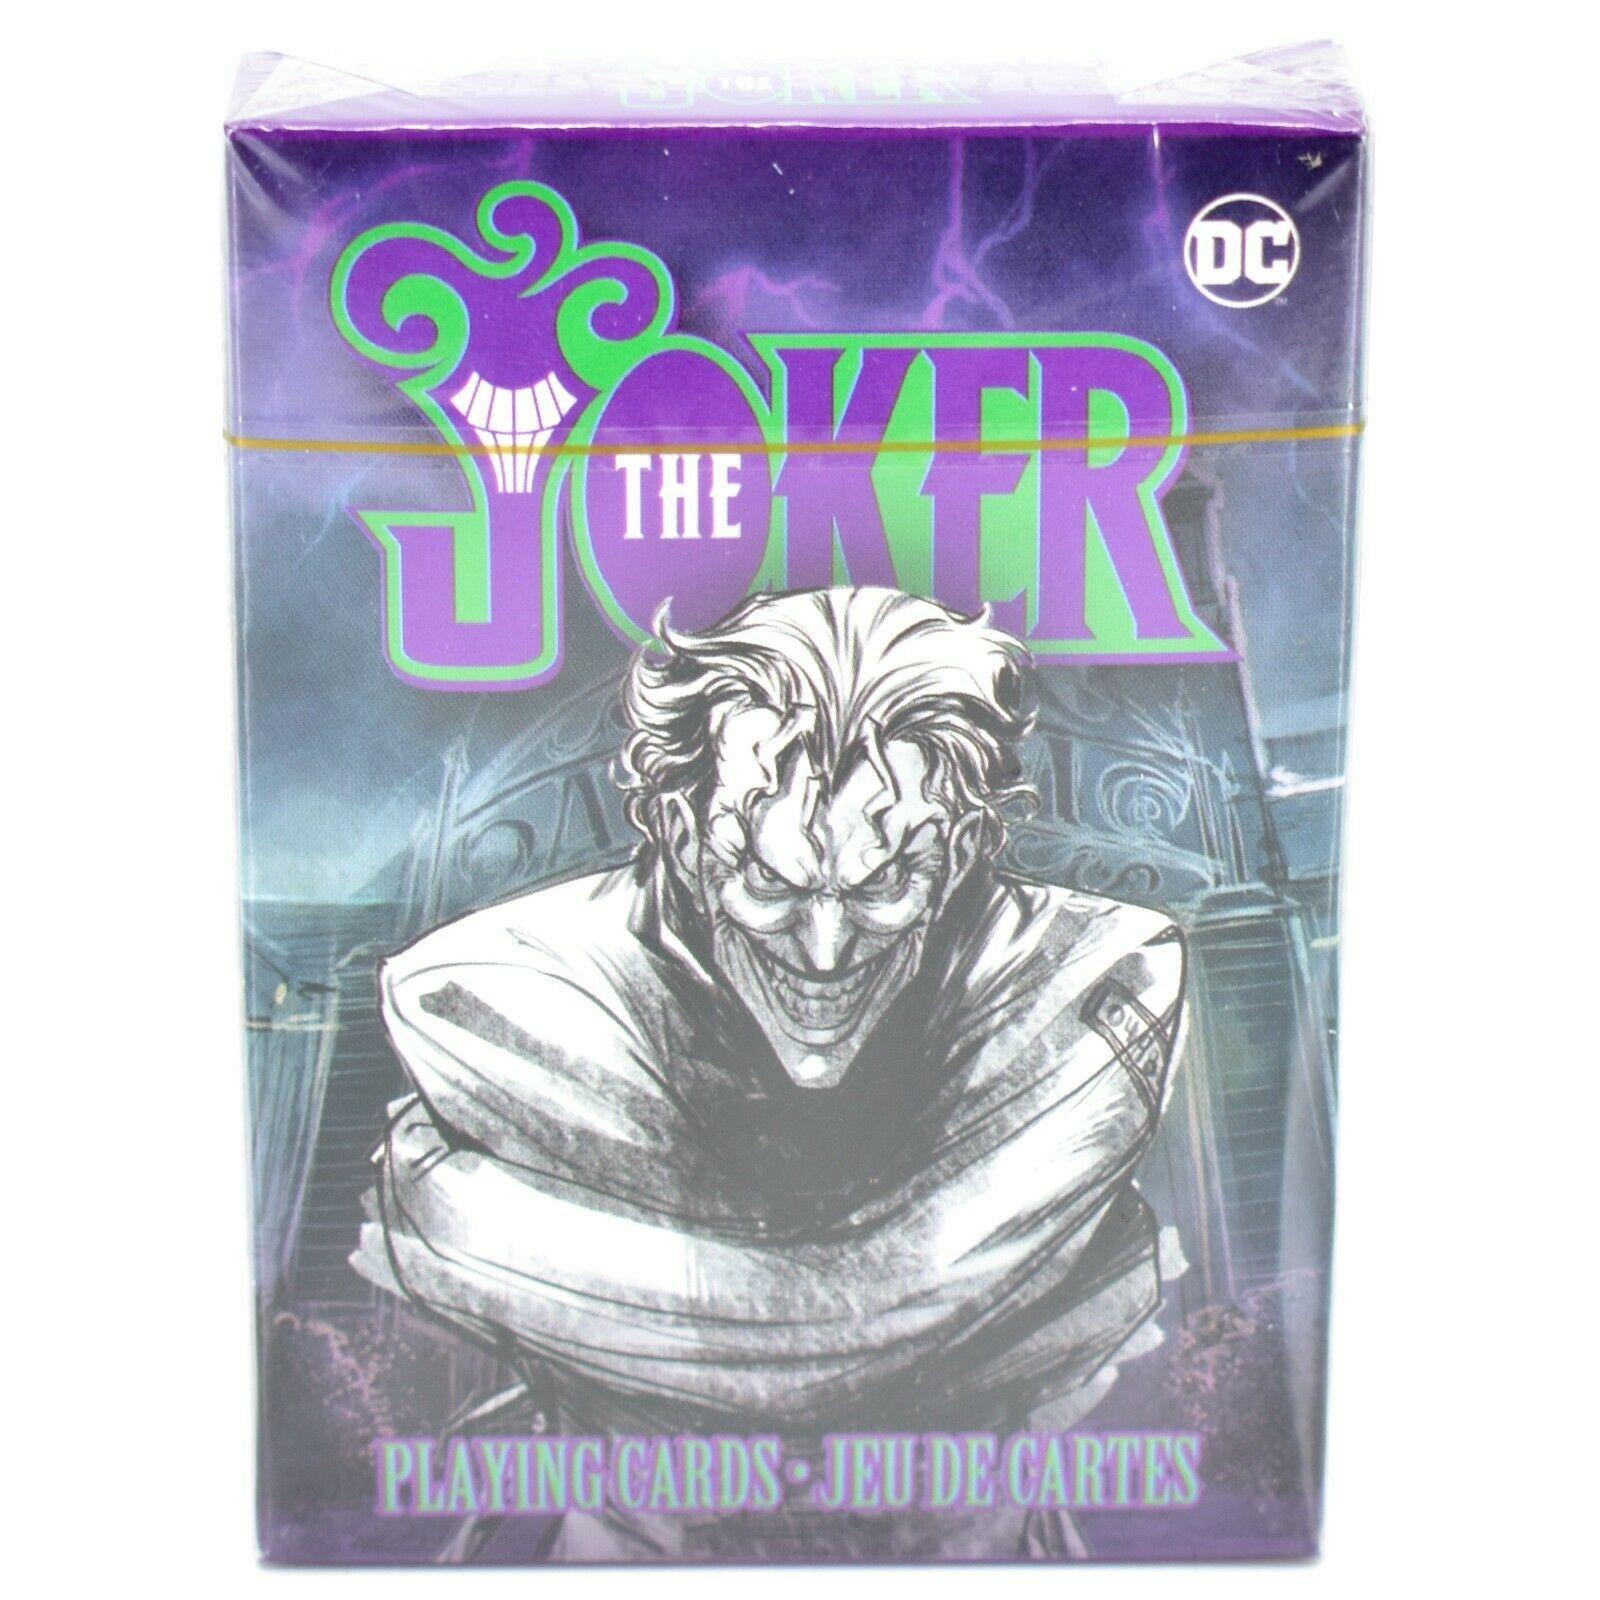 Aquarius DC Comics Batman The Joker Theme Playing Card Deck